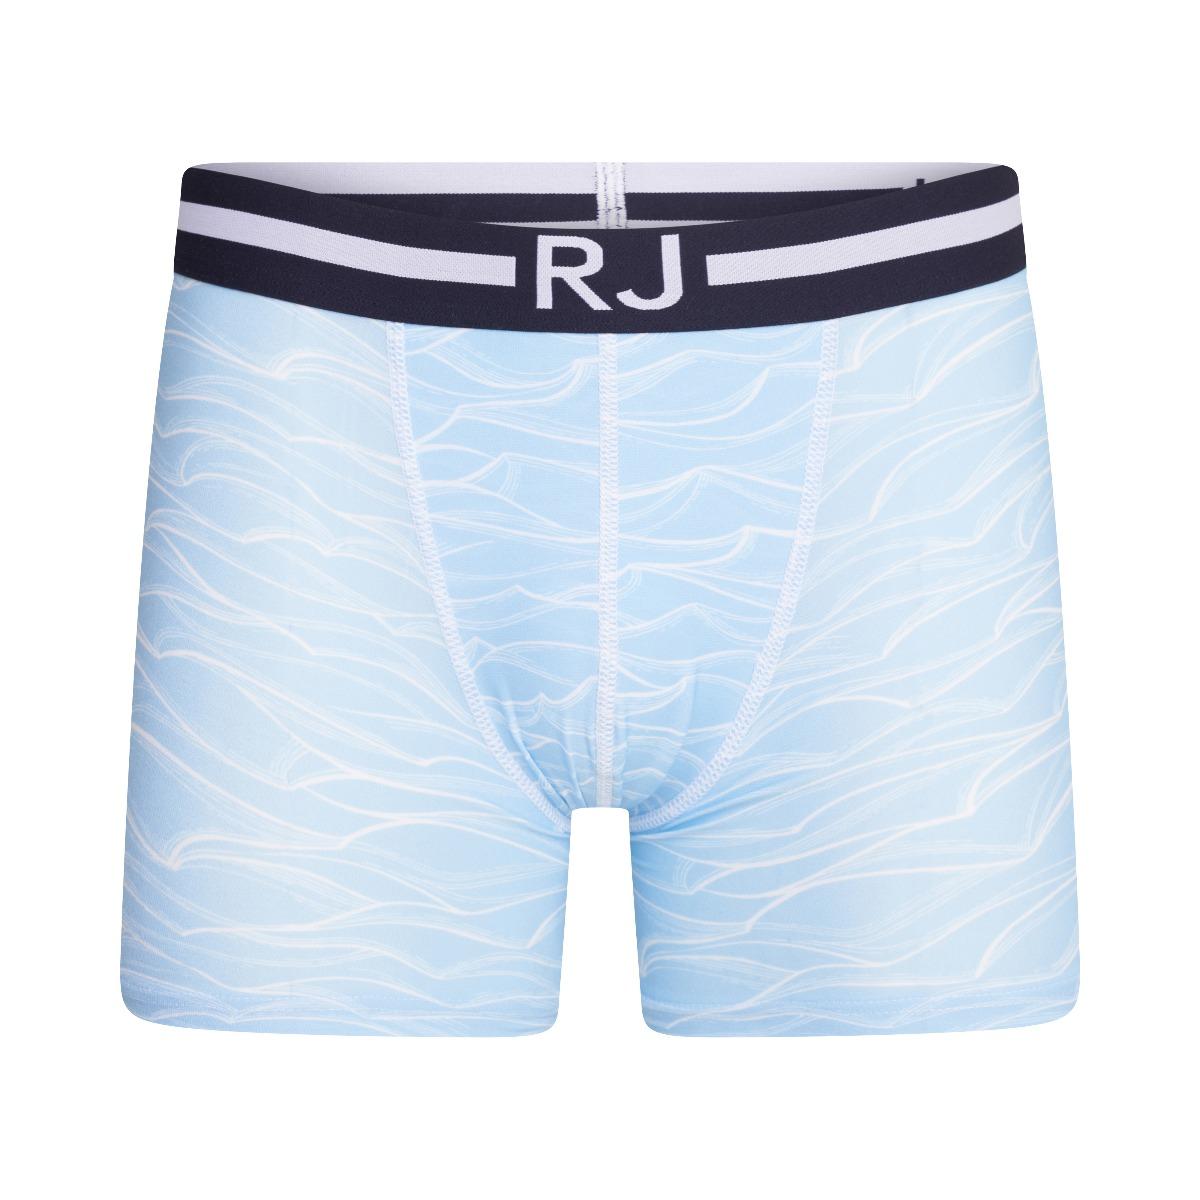 RJ Pure Fashion Heren Boxershort Sea XXL